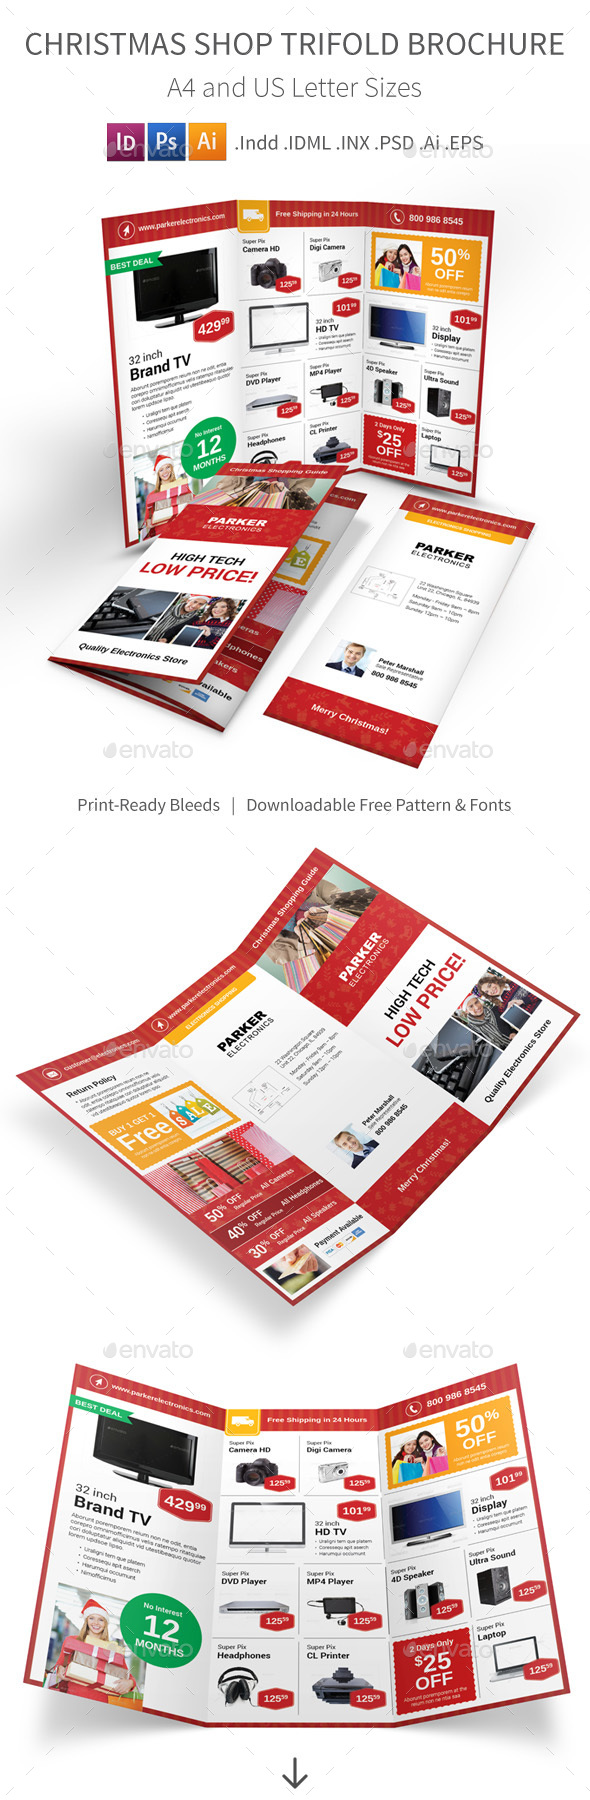 Christmas Shop Trifold Brochure - Corporate Brochures